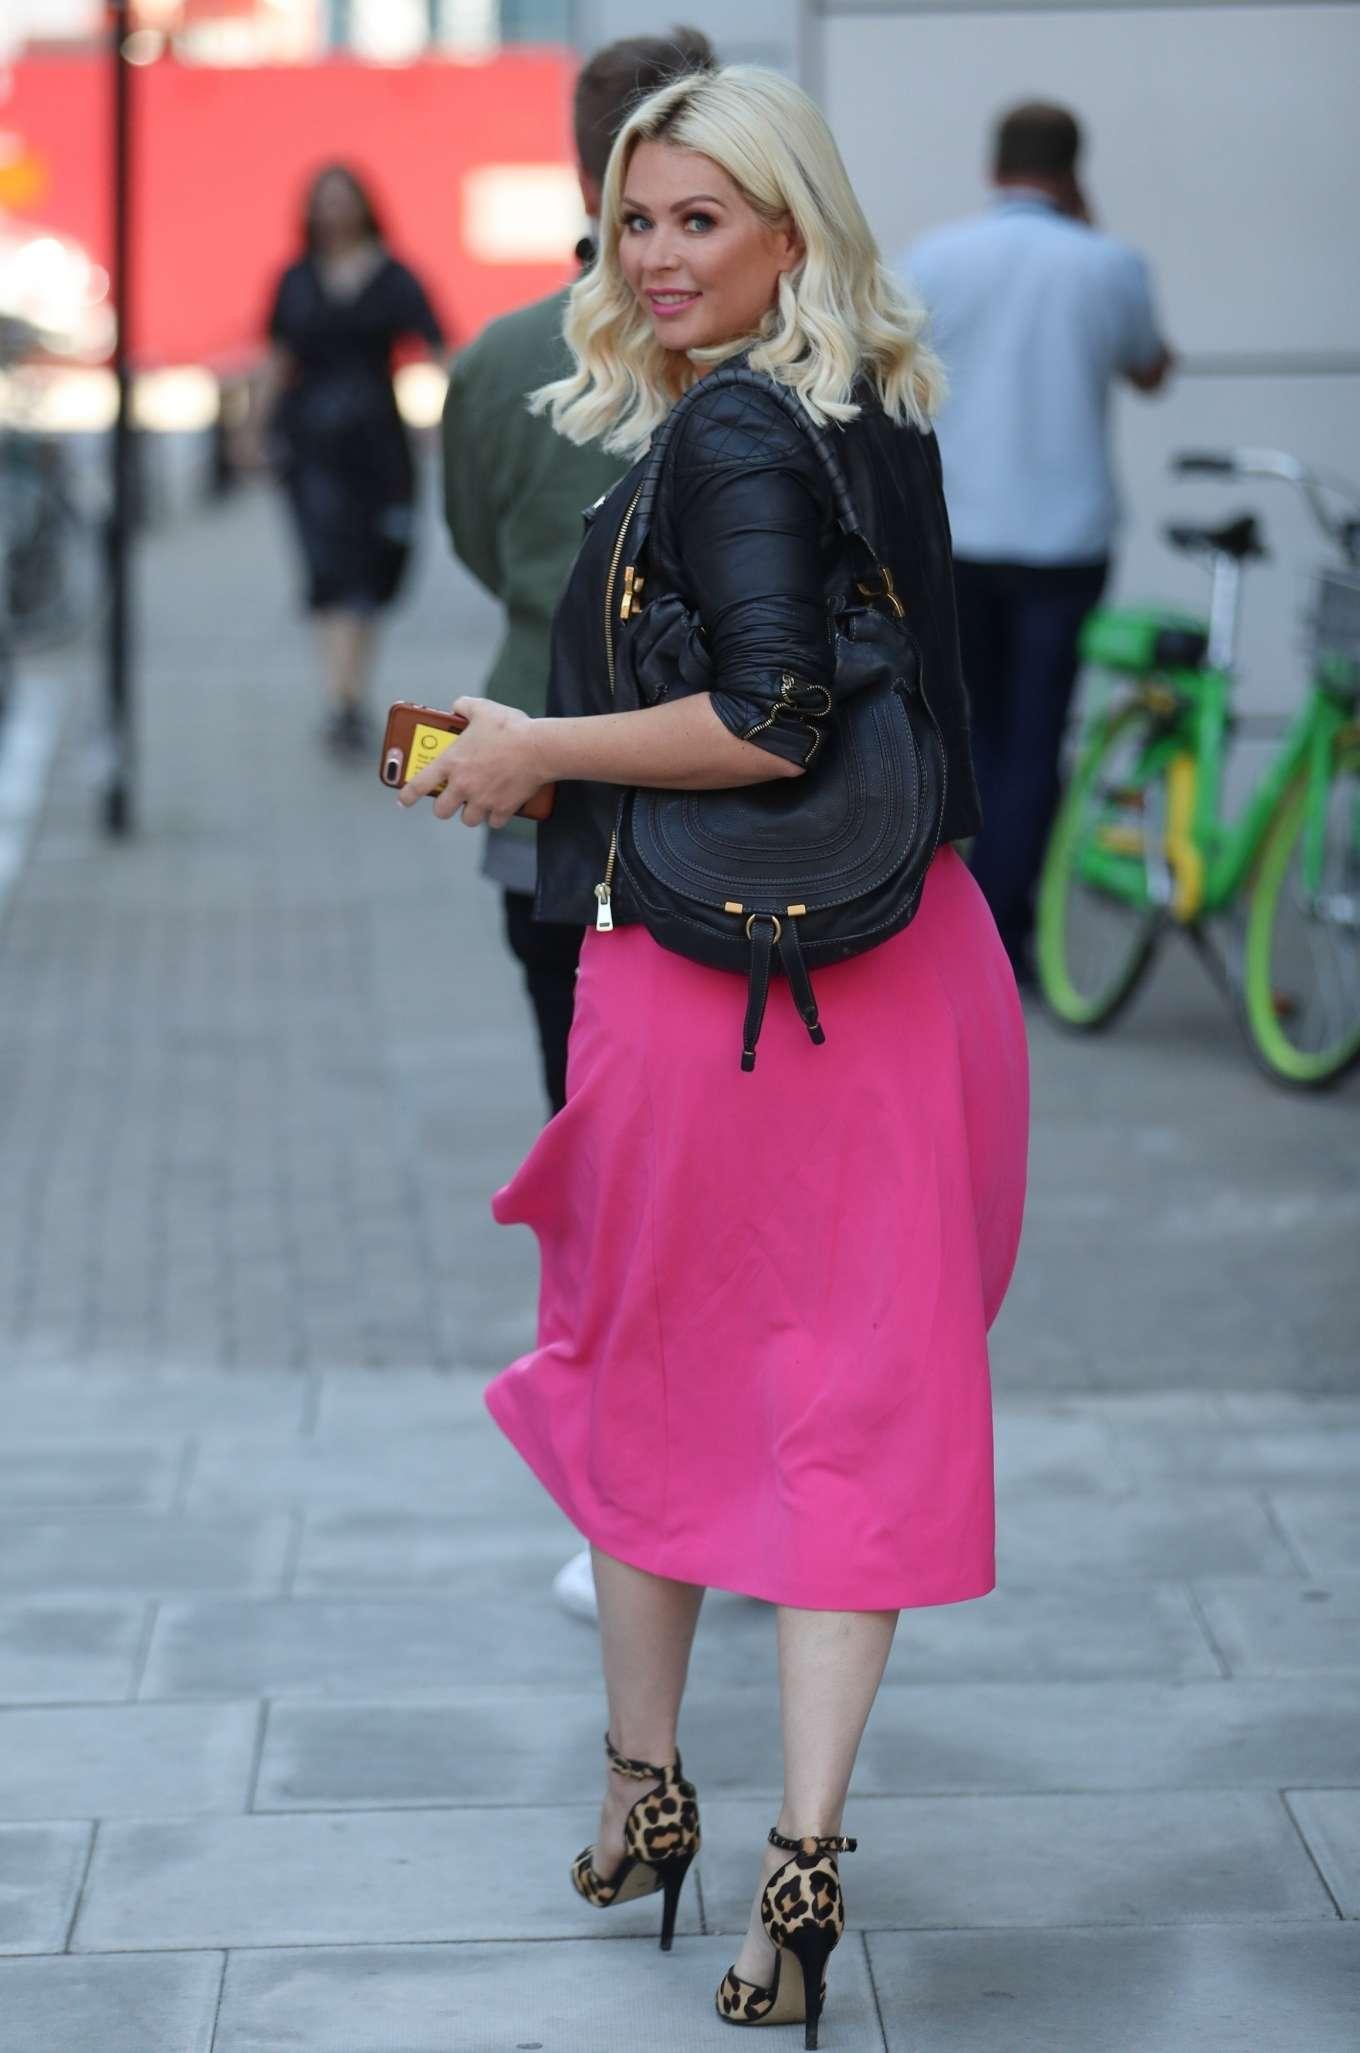 Nicola McLean 2019 : Nicola Mclean – In flirty pink dress exits Jeremy Vine show in London-13